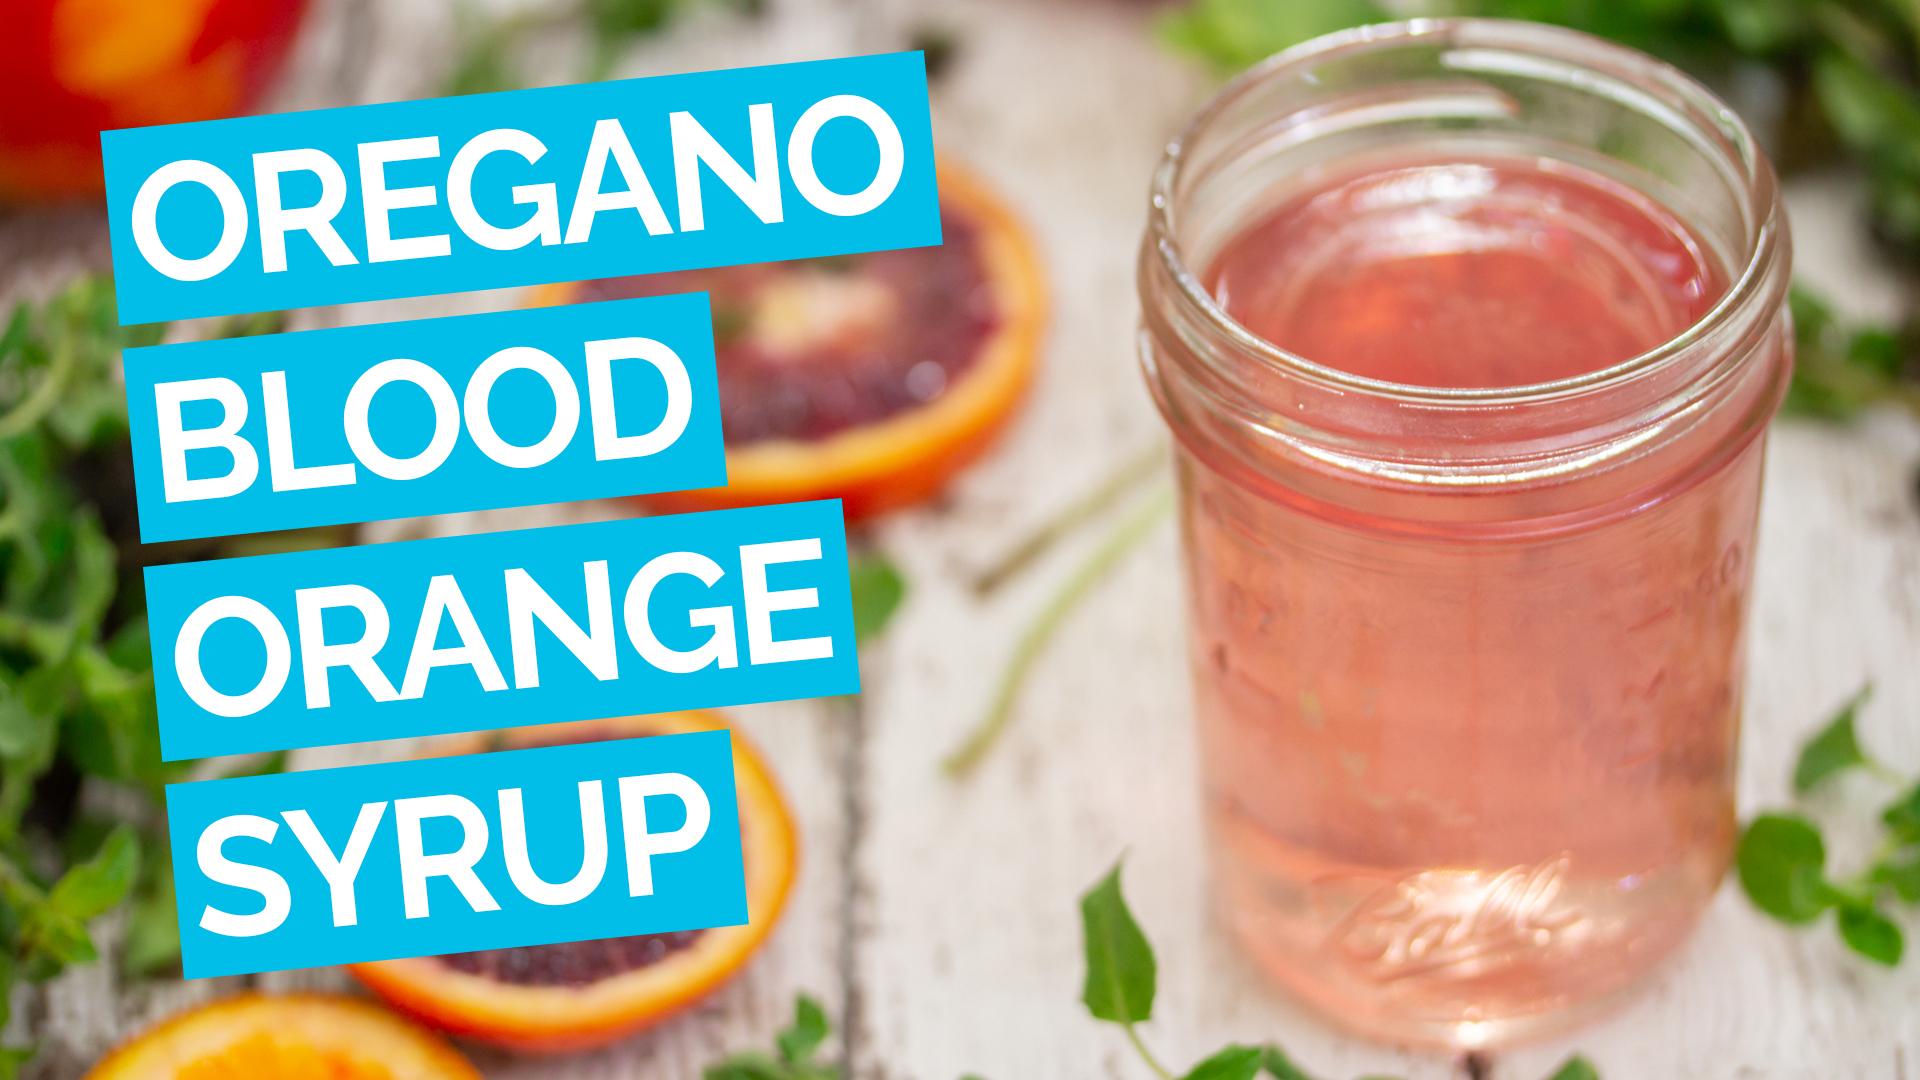 Oregano & Blood Orange Simple Syrup